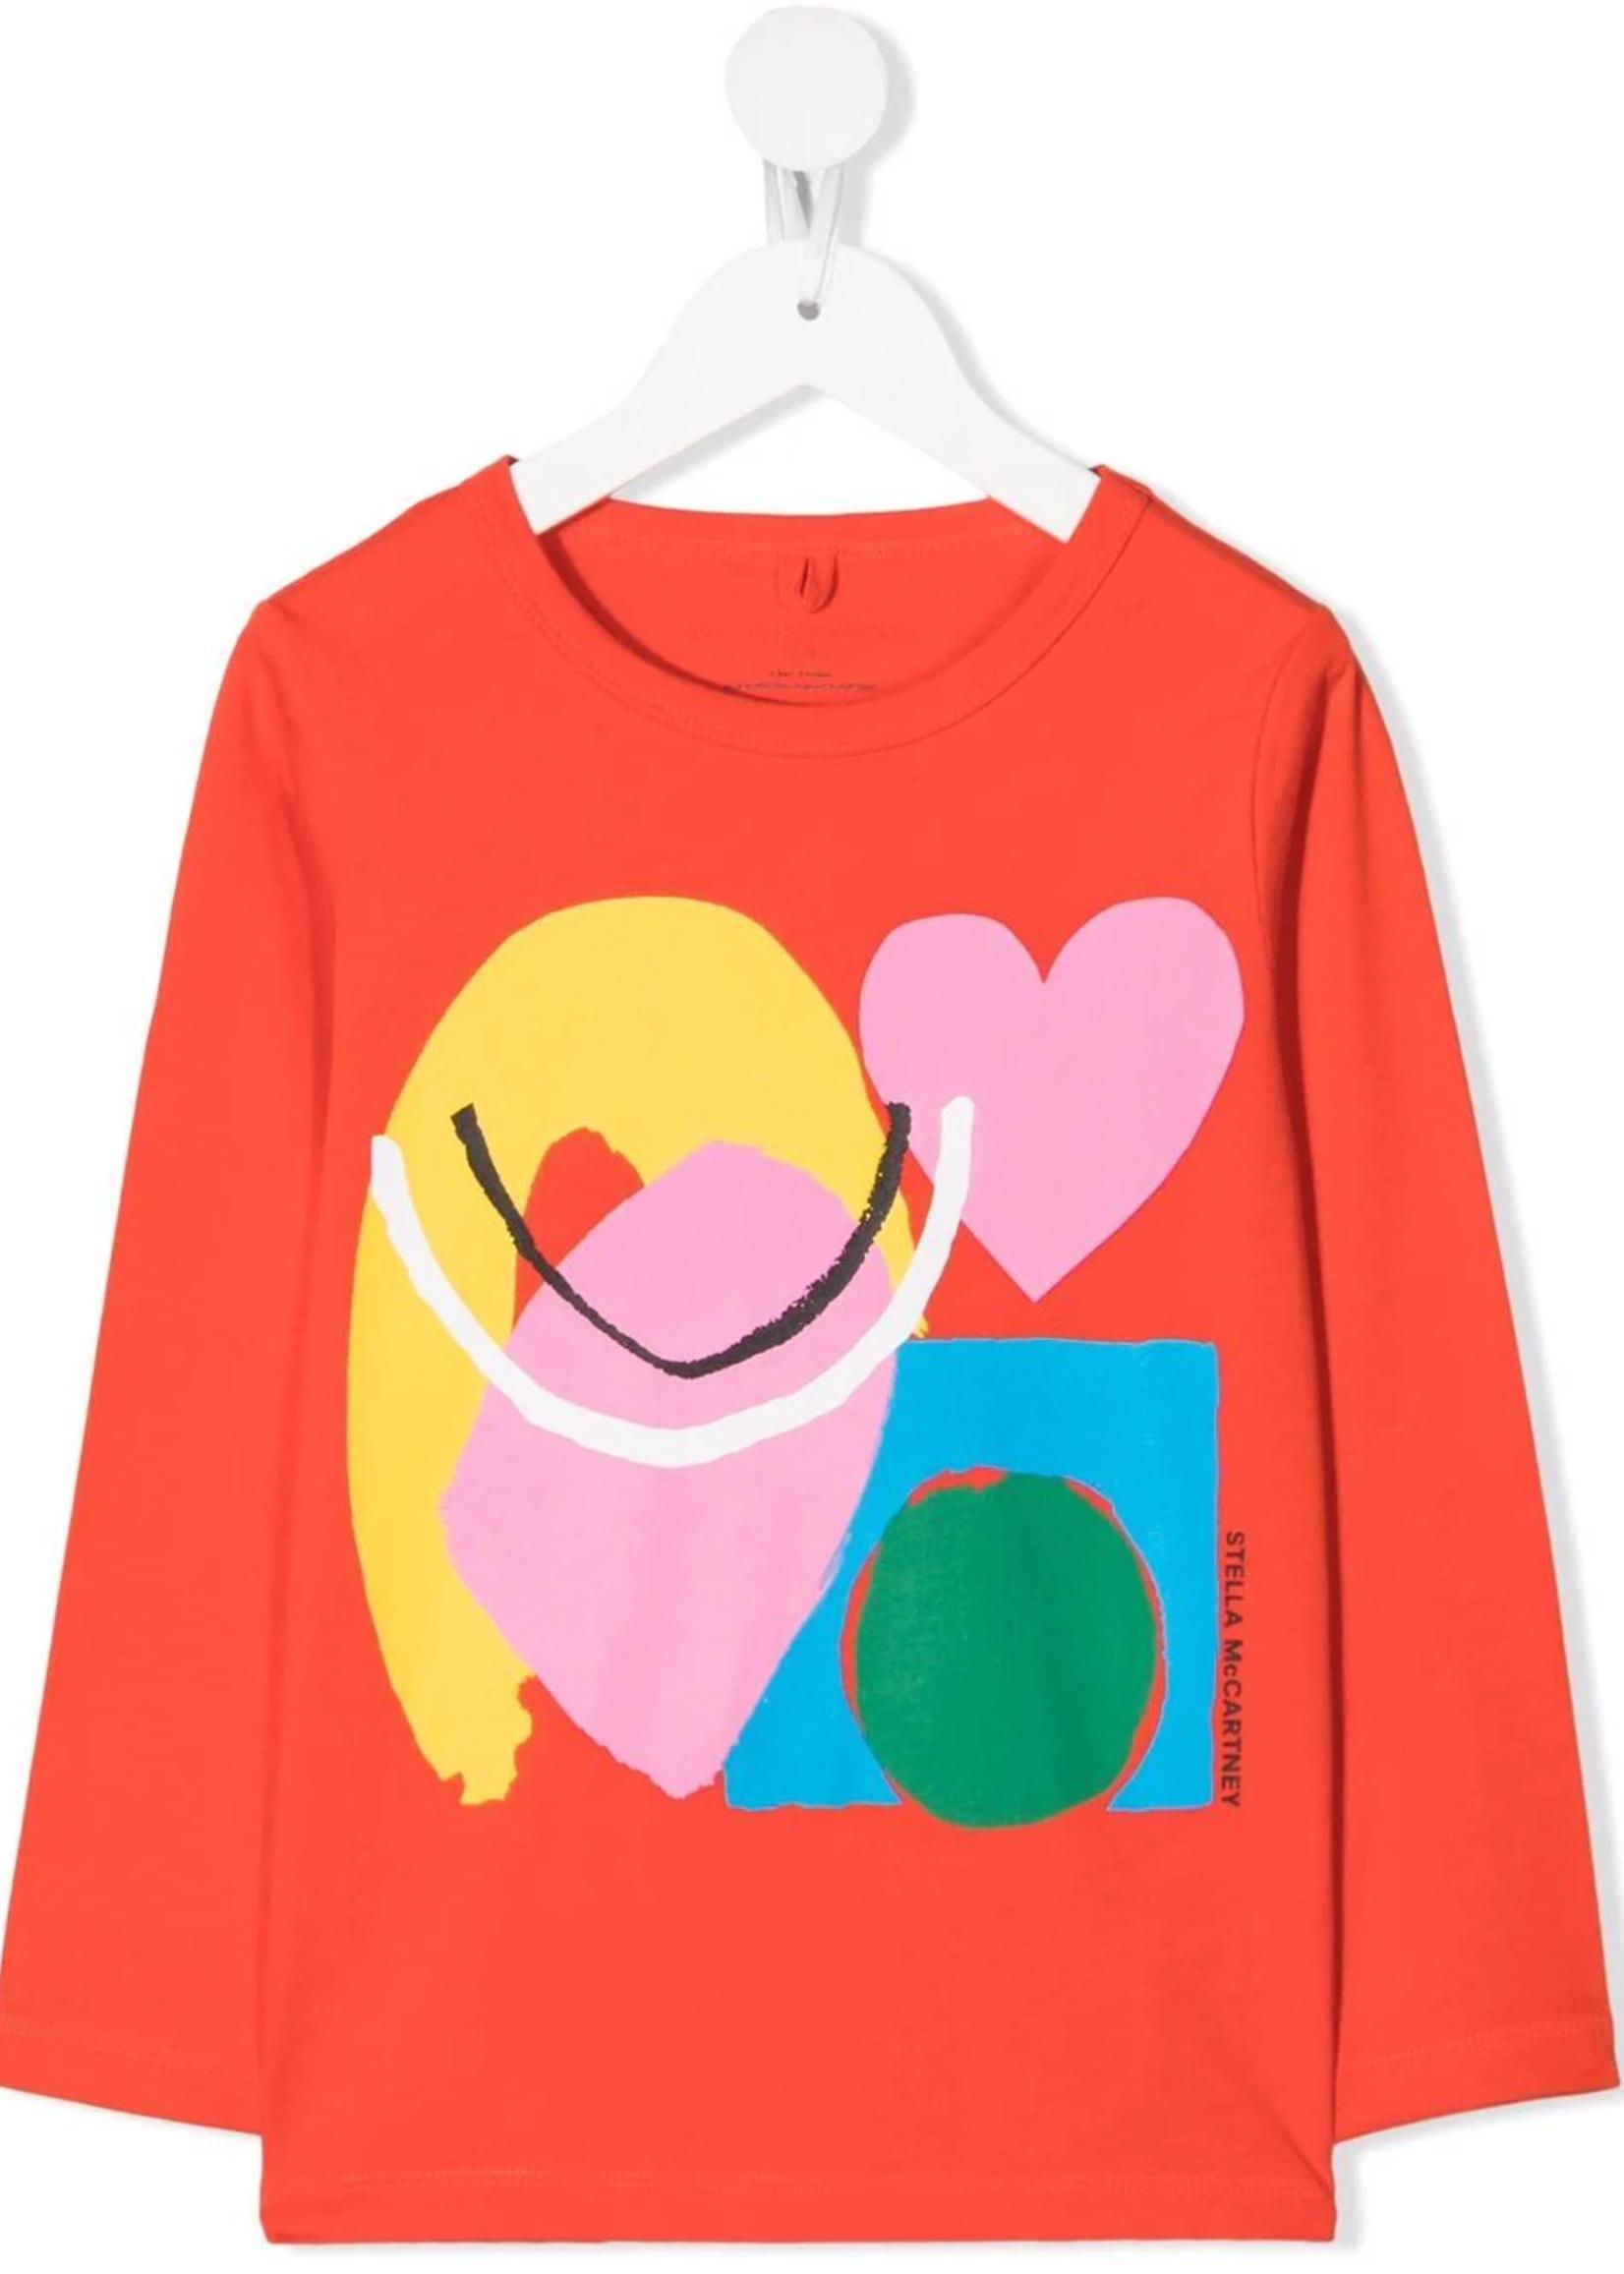 Stella McCartney Stella Mccartney-AW21 603012 Paint Heart-print long-sleeve T-shirt